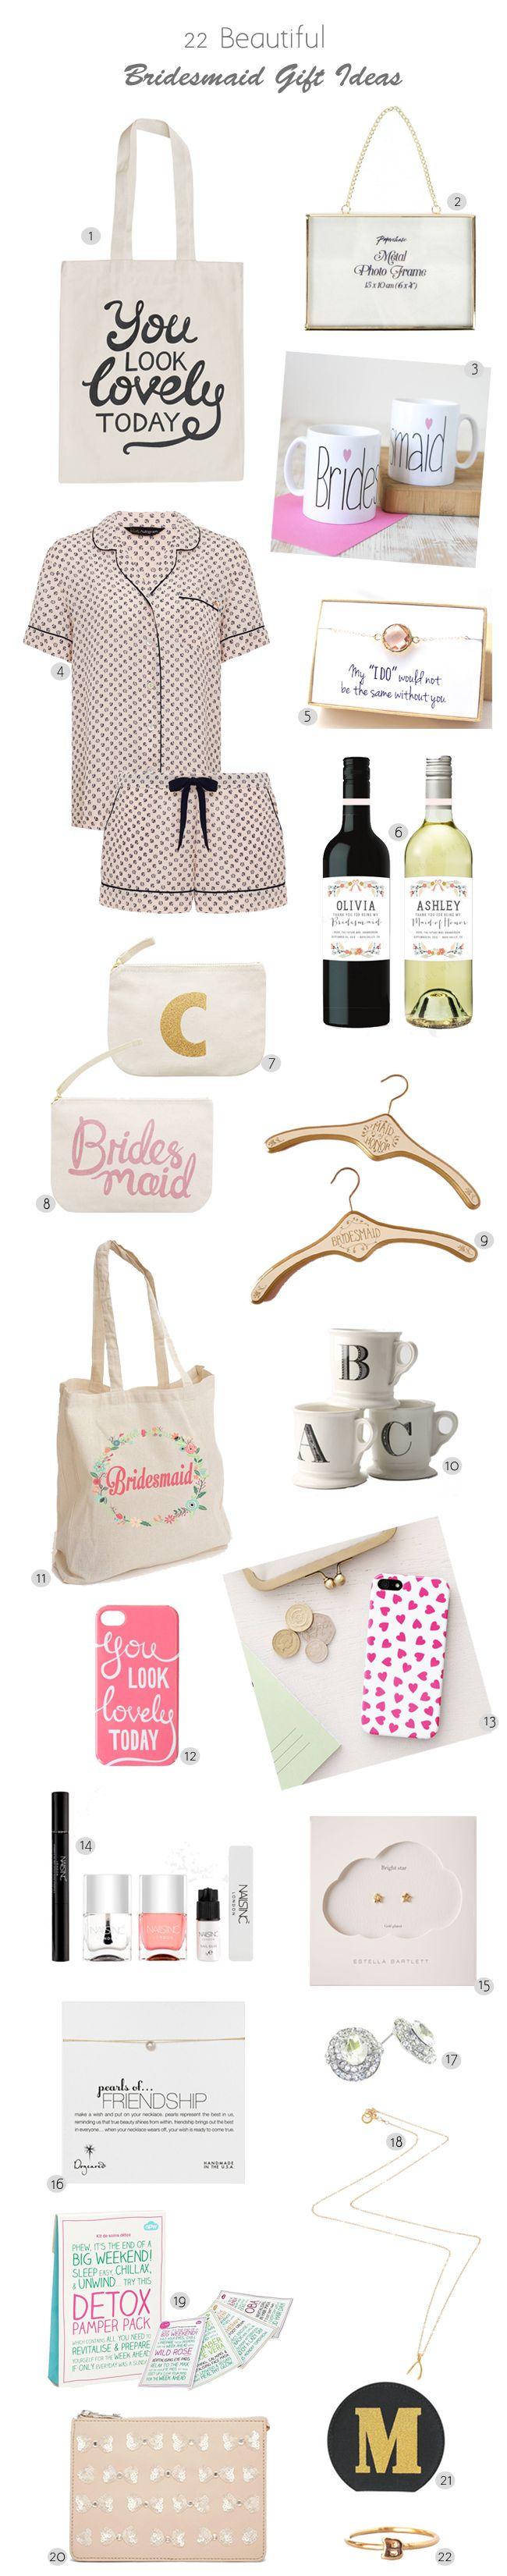 22 Beautiful Bridesmaid Gift Ideas | weddingsonline